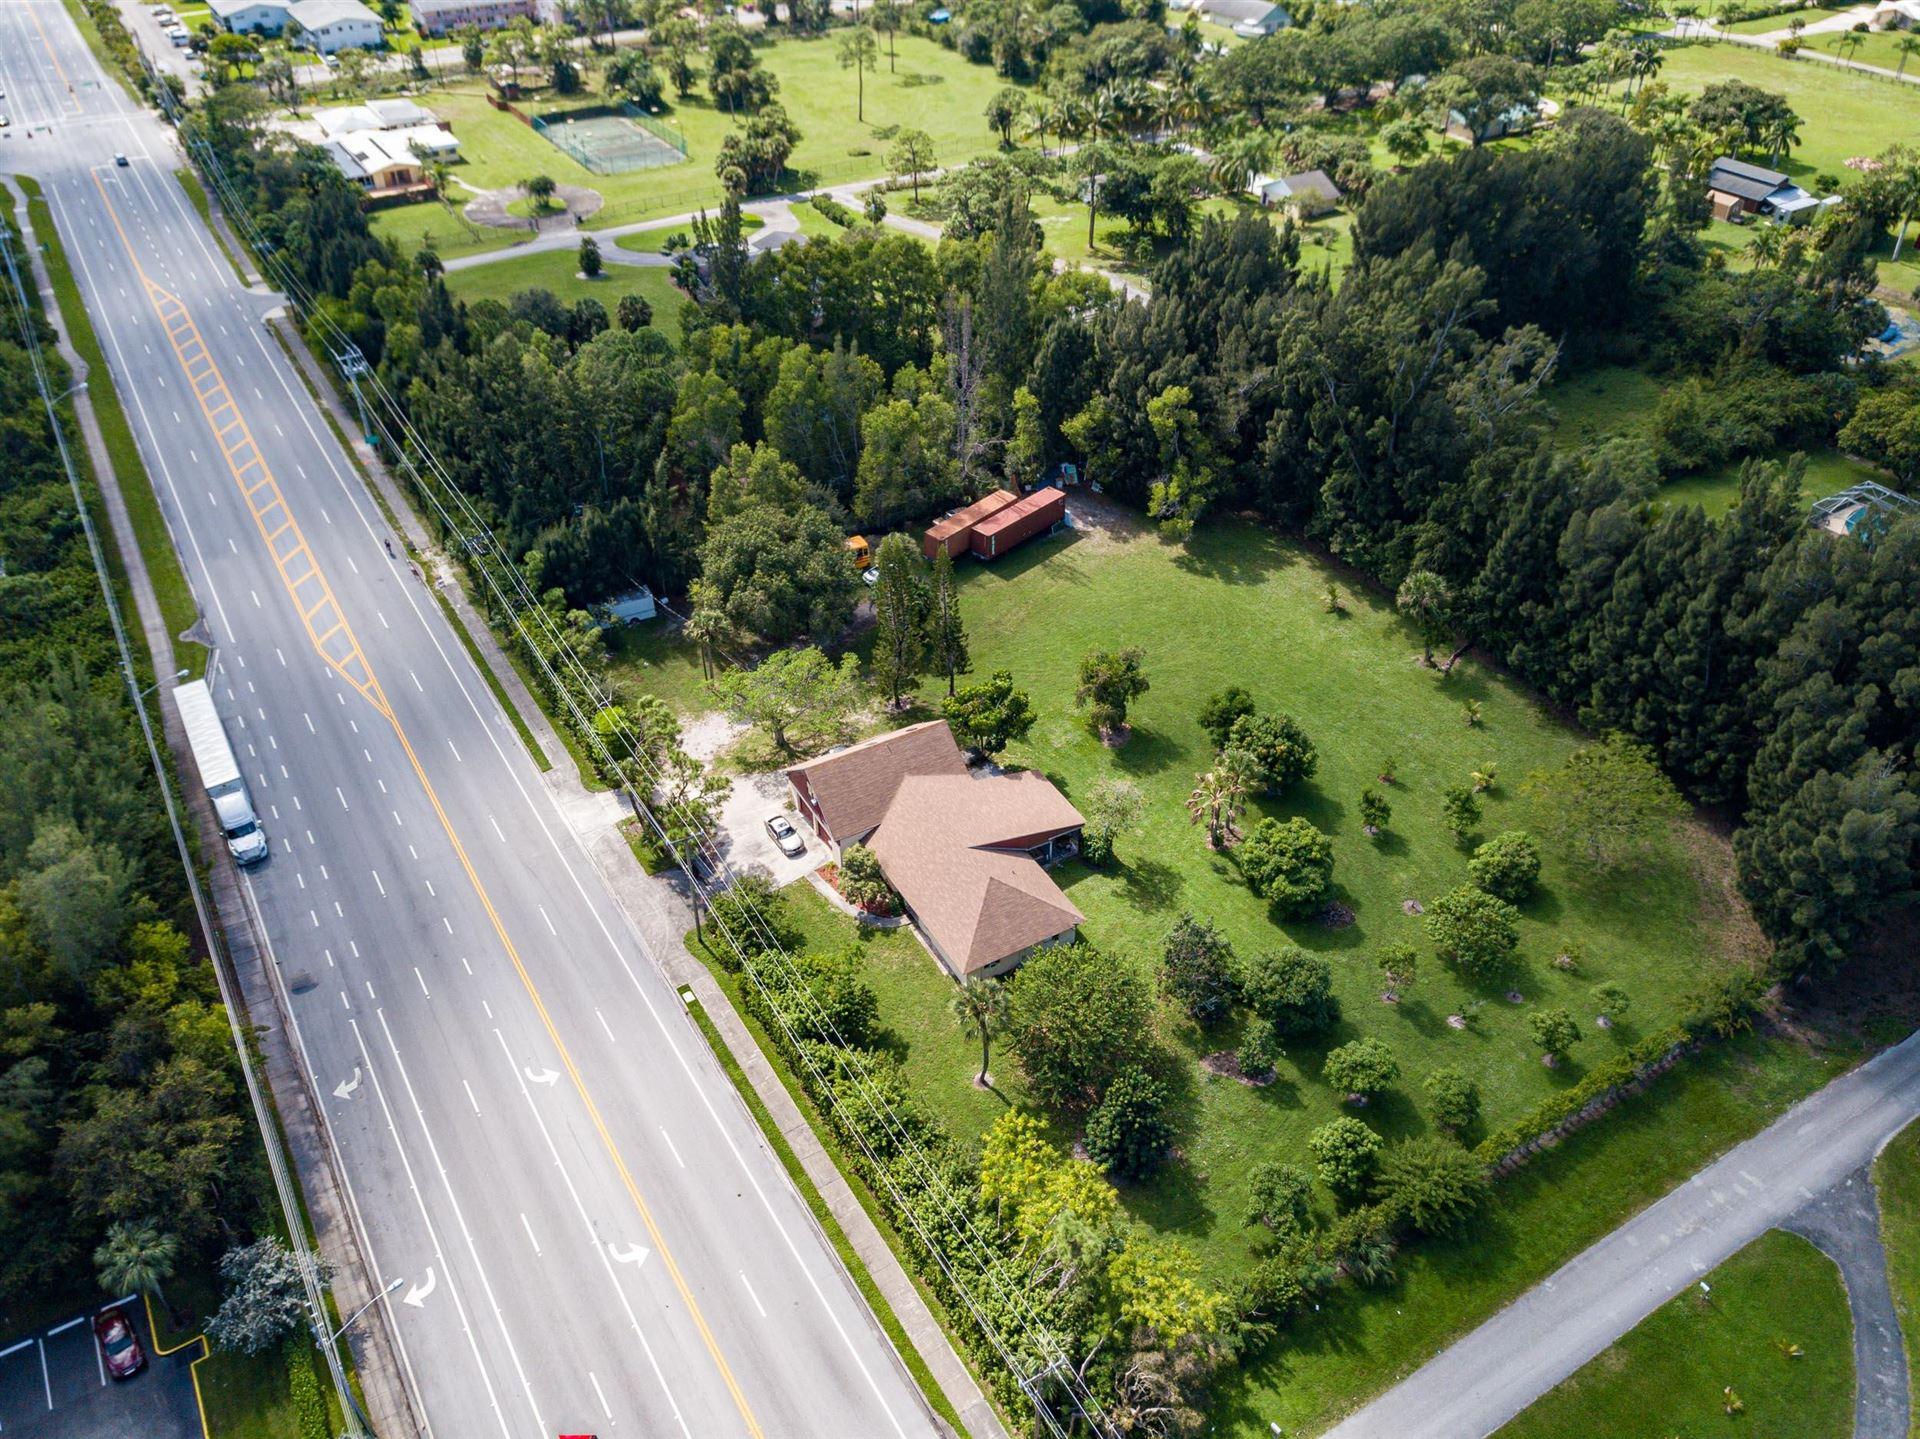 Photo of 3157 N Haverhill Road, West Palm Beach, FL 33417 (MLS # RX-10645344)